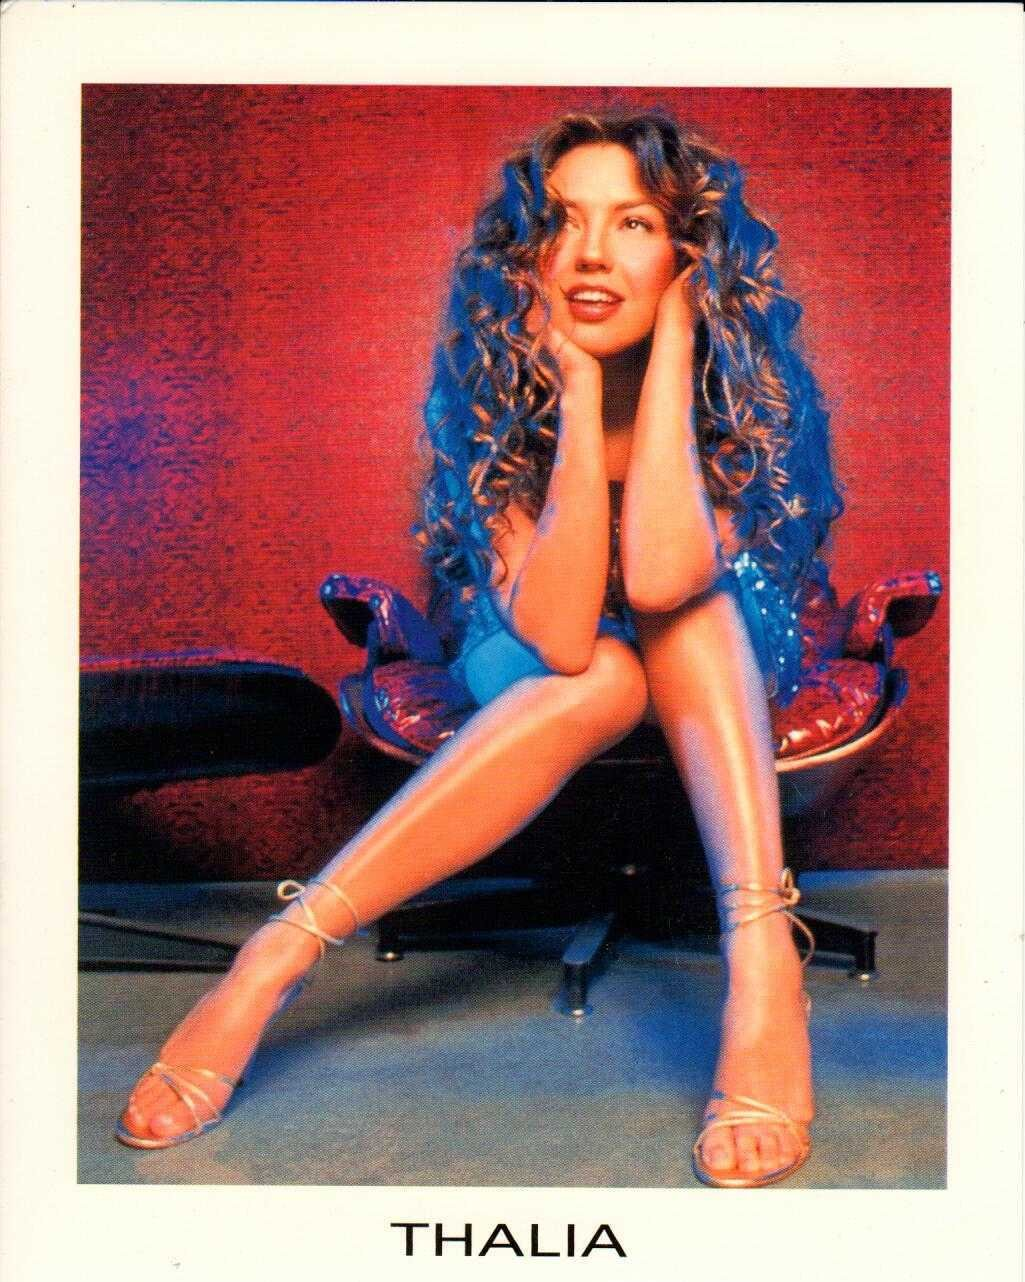 "THALIA Regresa A Mi 2000 US 5"" X 7"" Official Two Sided Postcard"